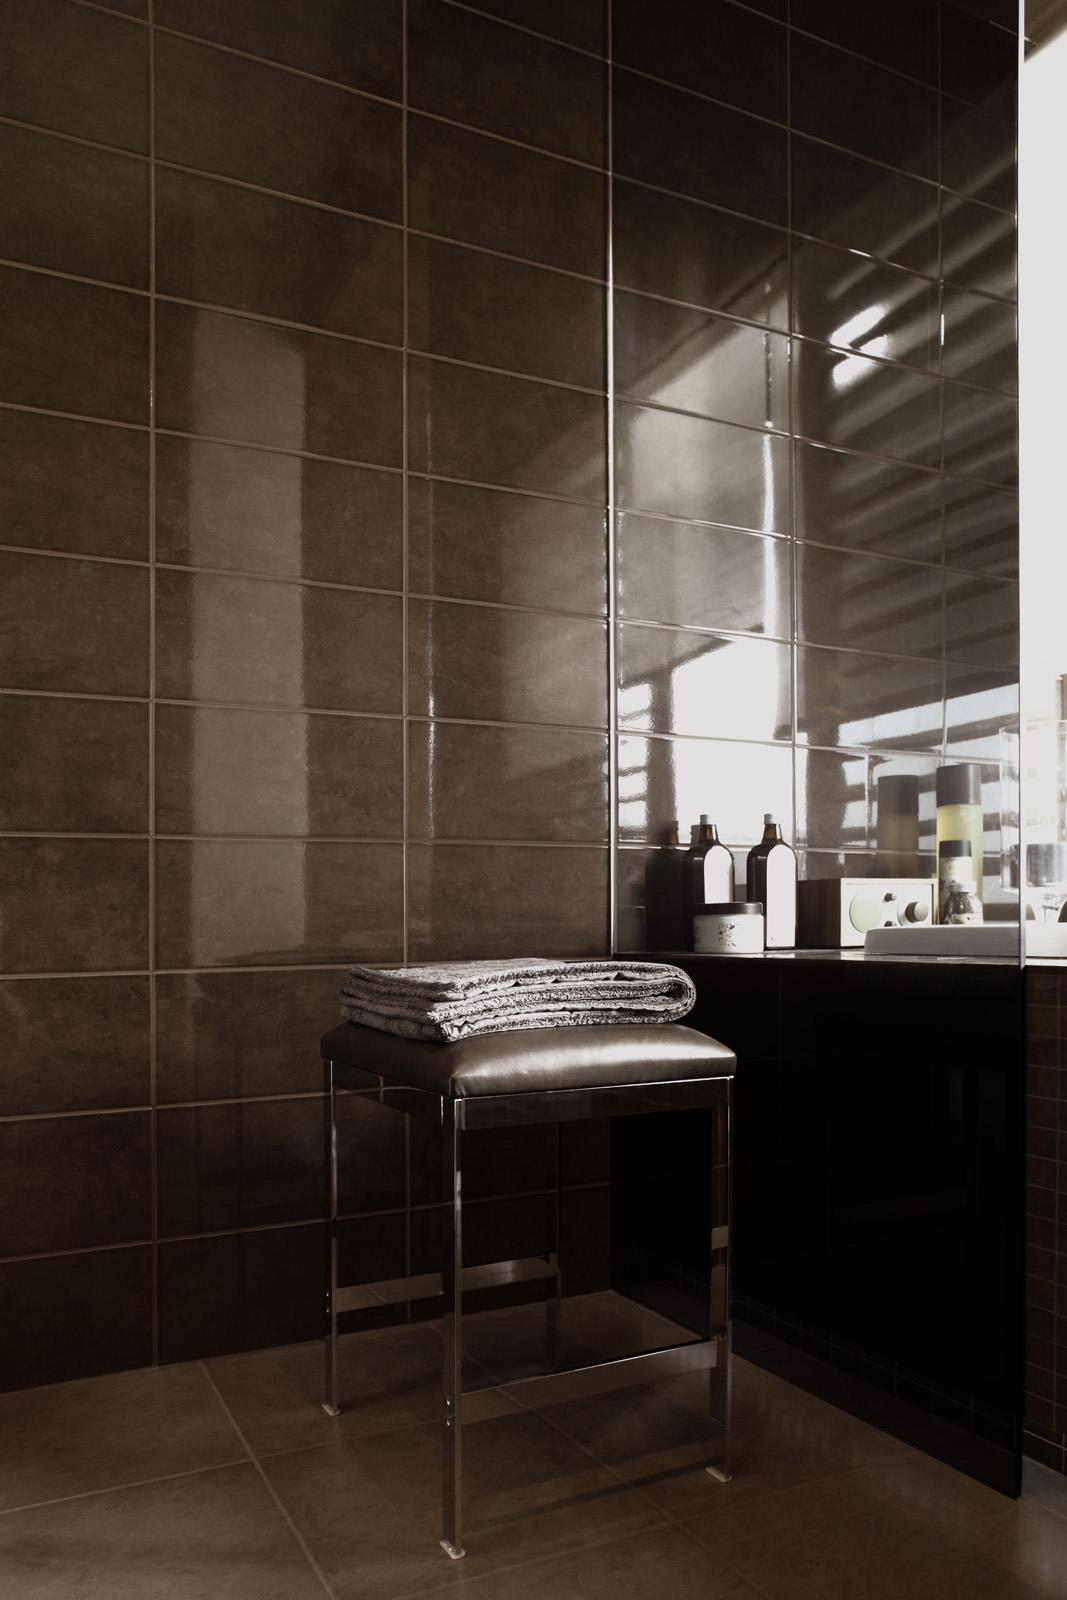 Suite - Ceramica lucida effetto marmo  Marazzi